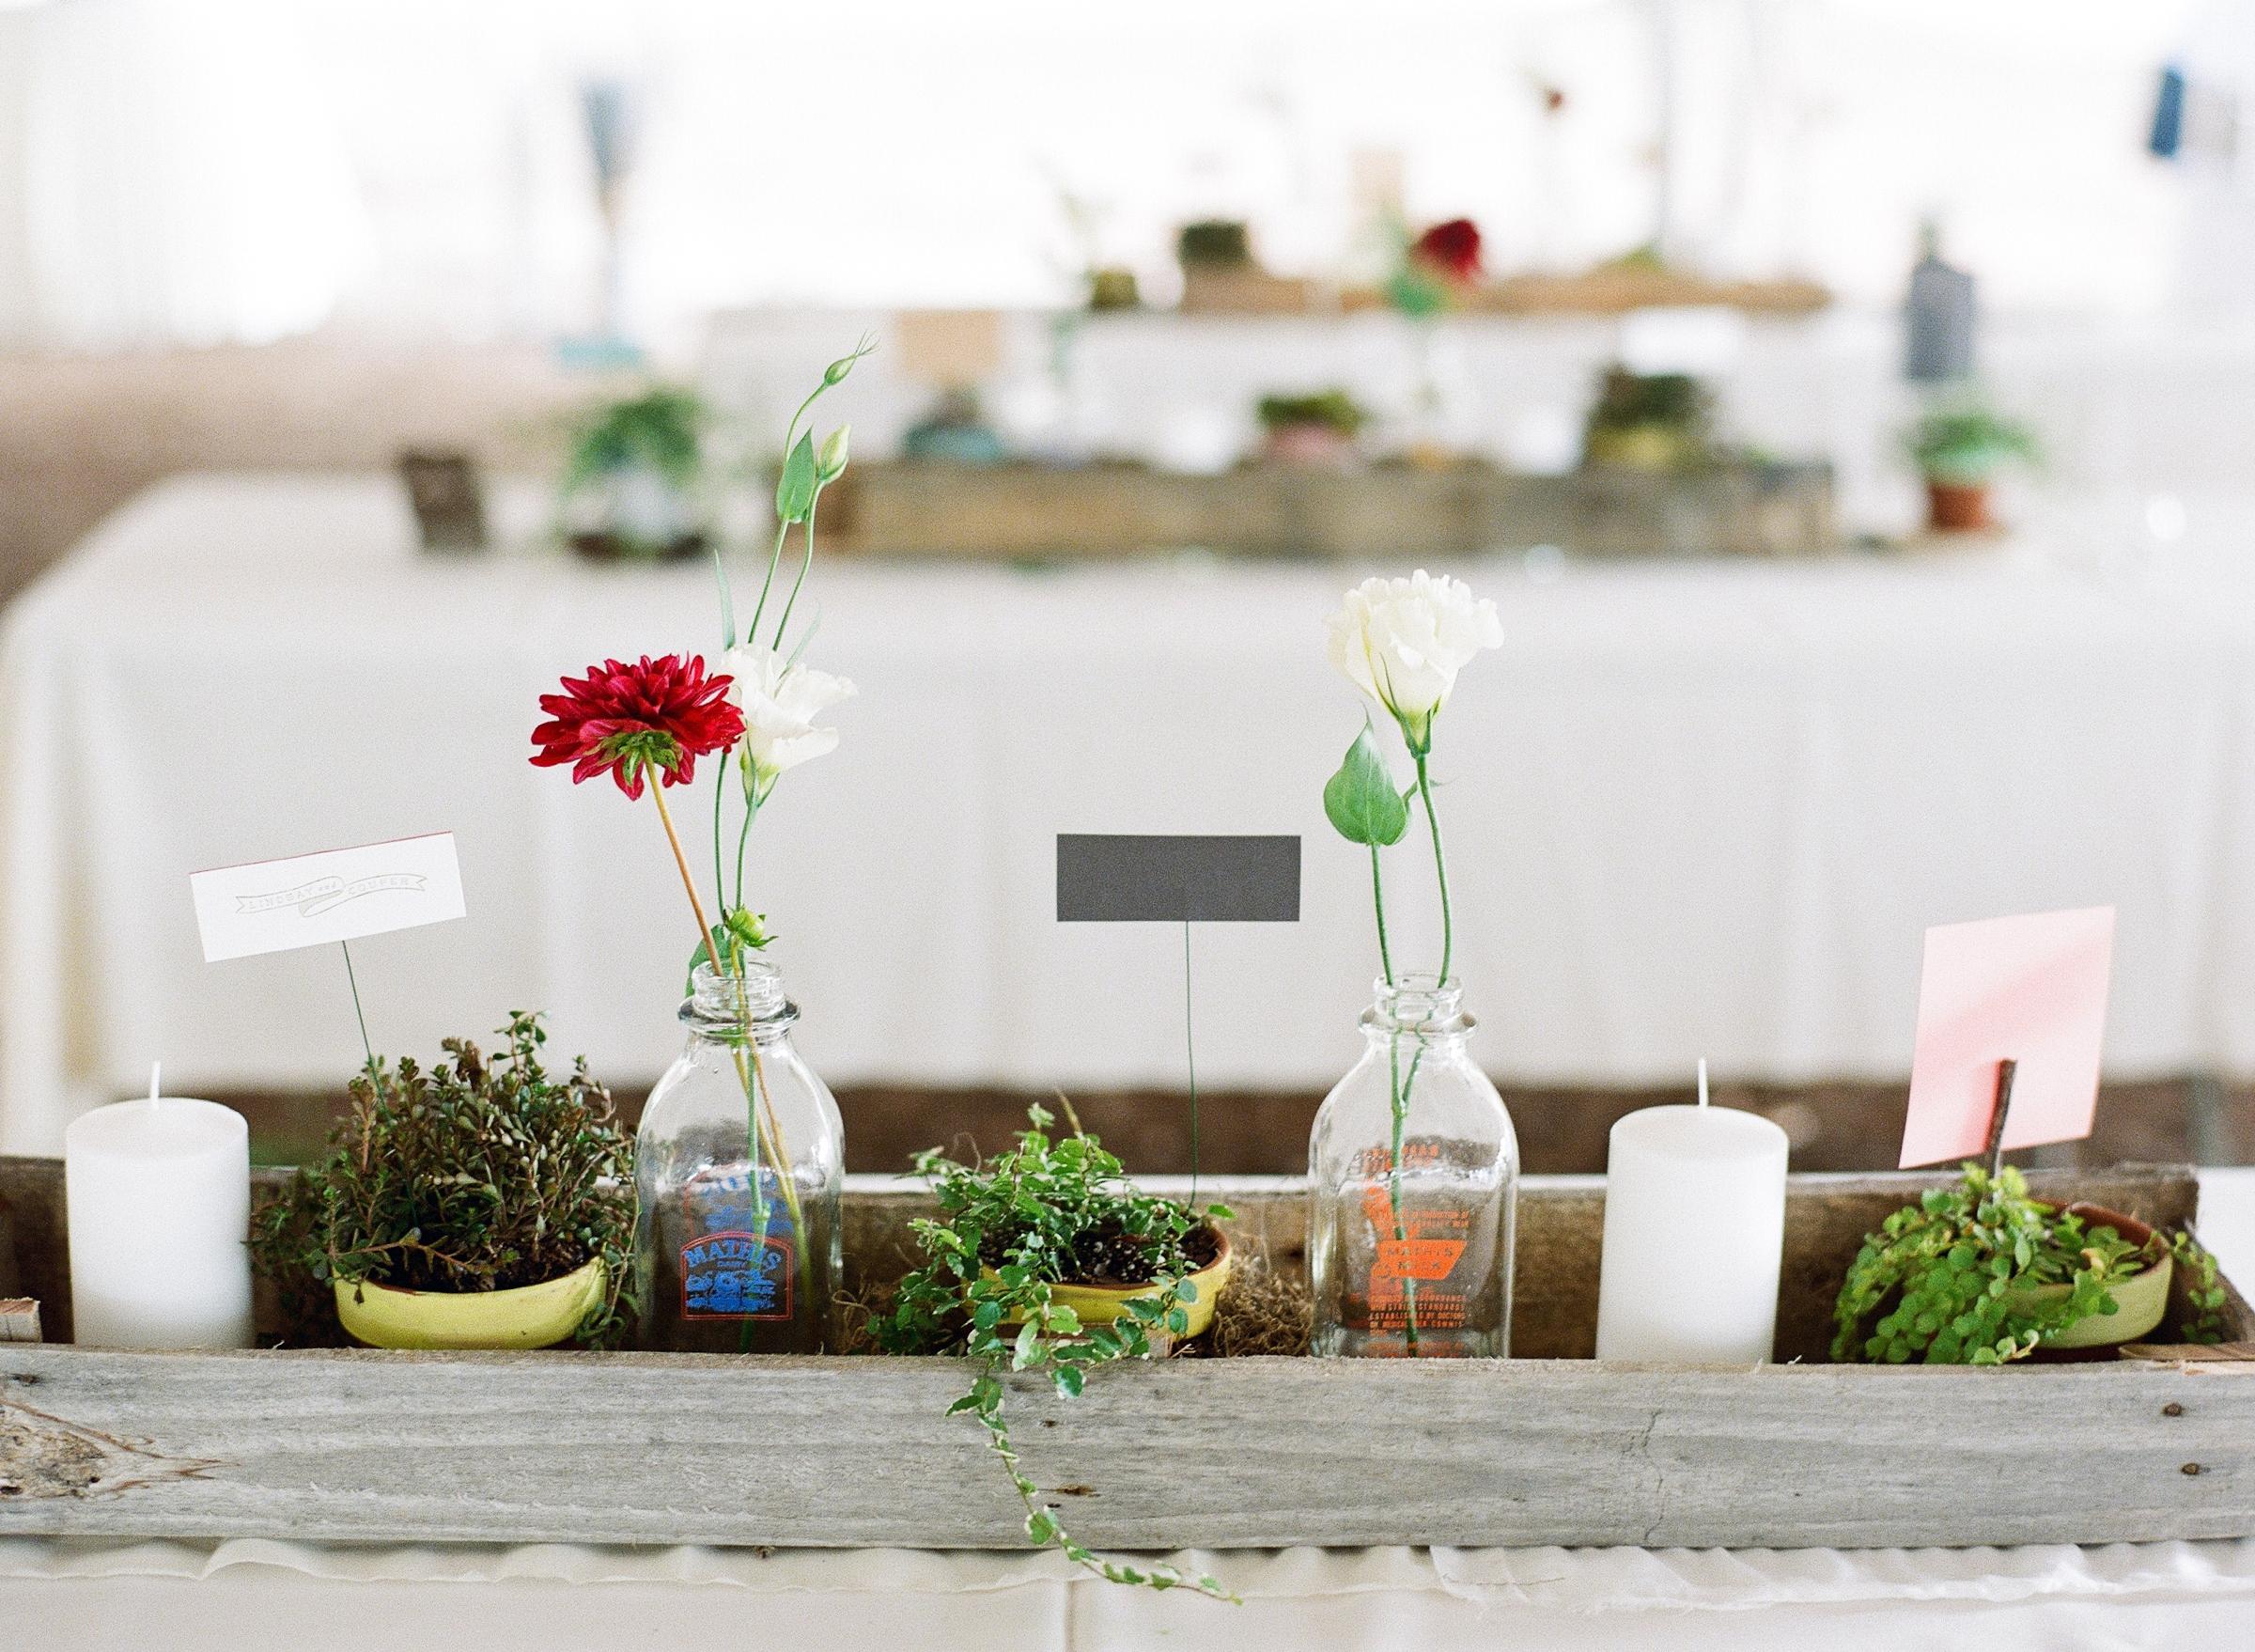 st_simons_island_wedding_photographer_shannon_griffin_0028.jpg